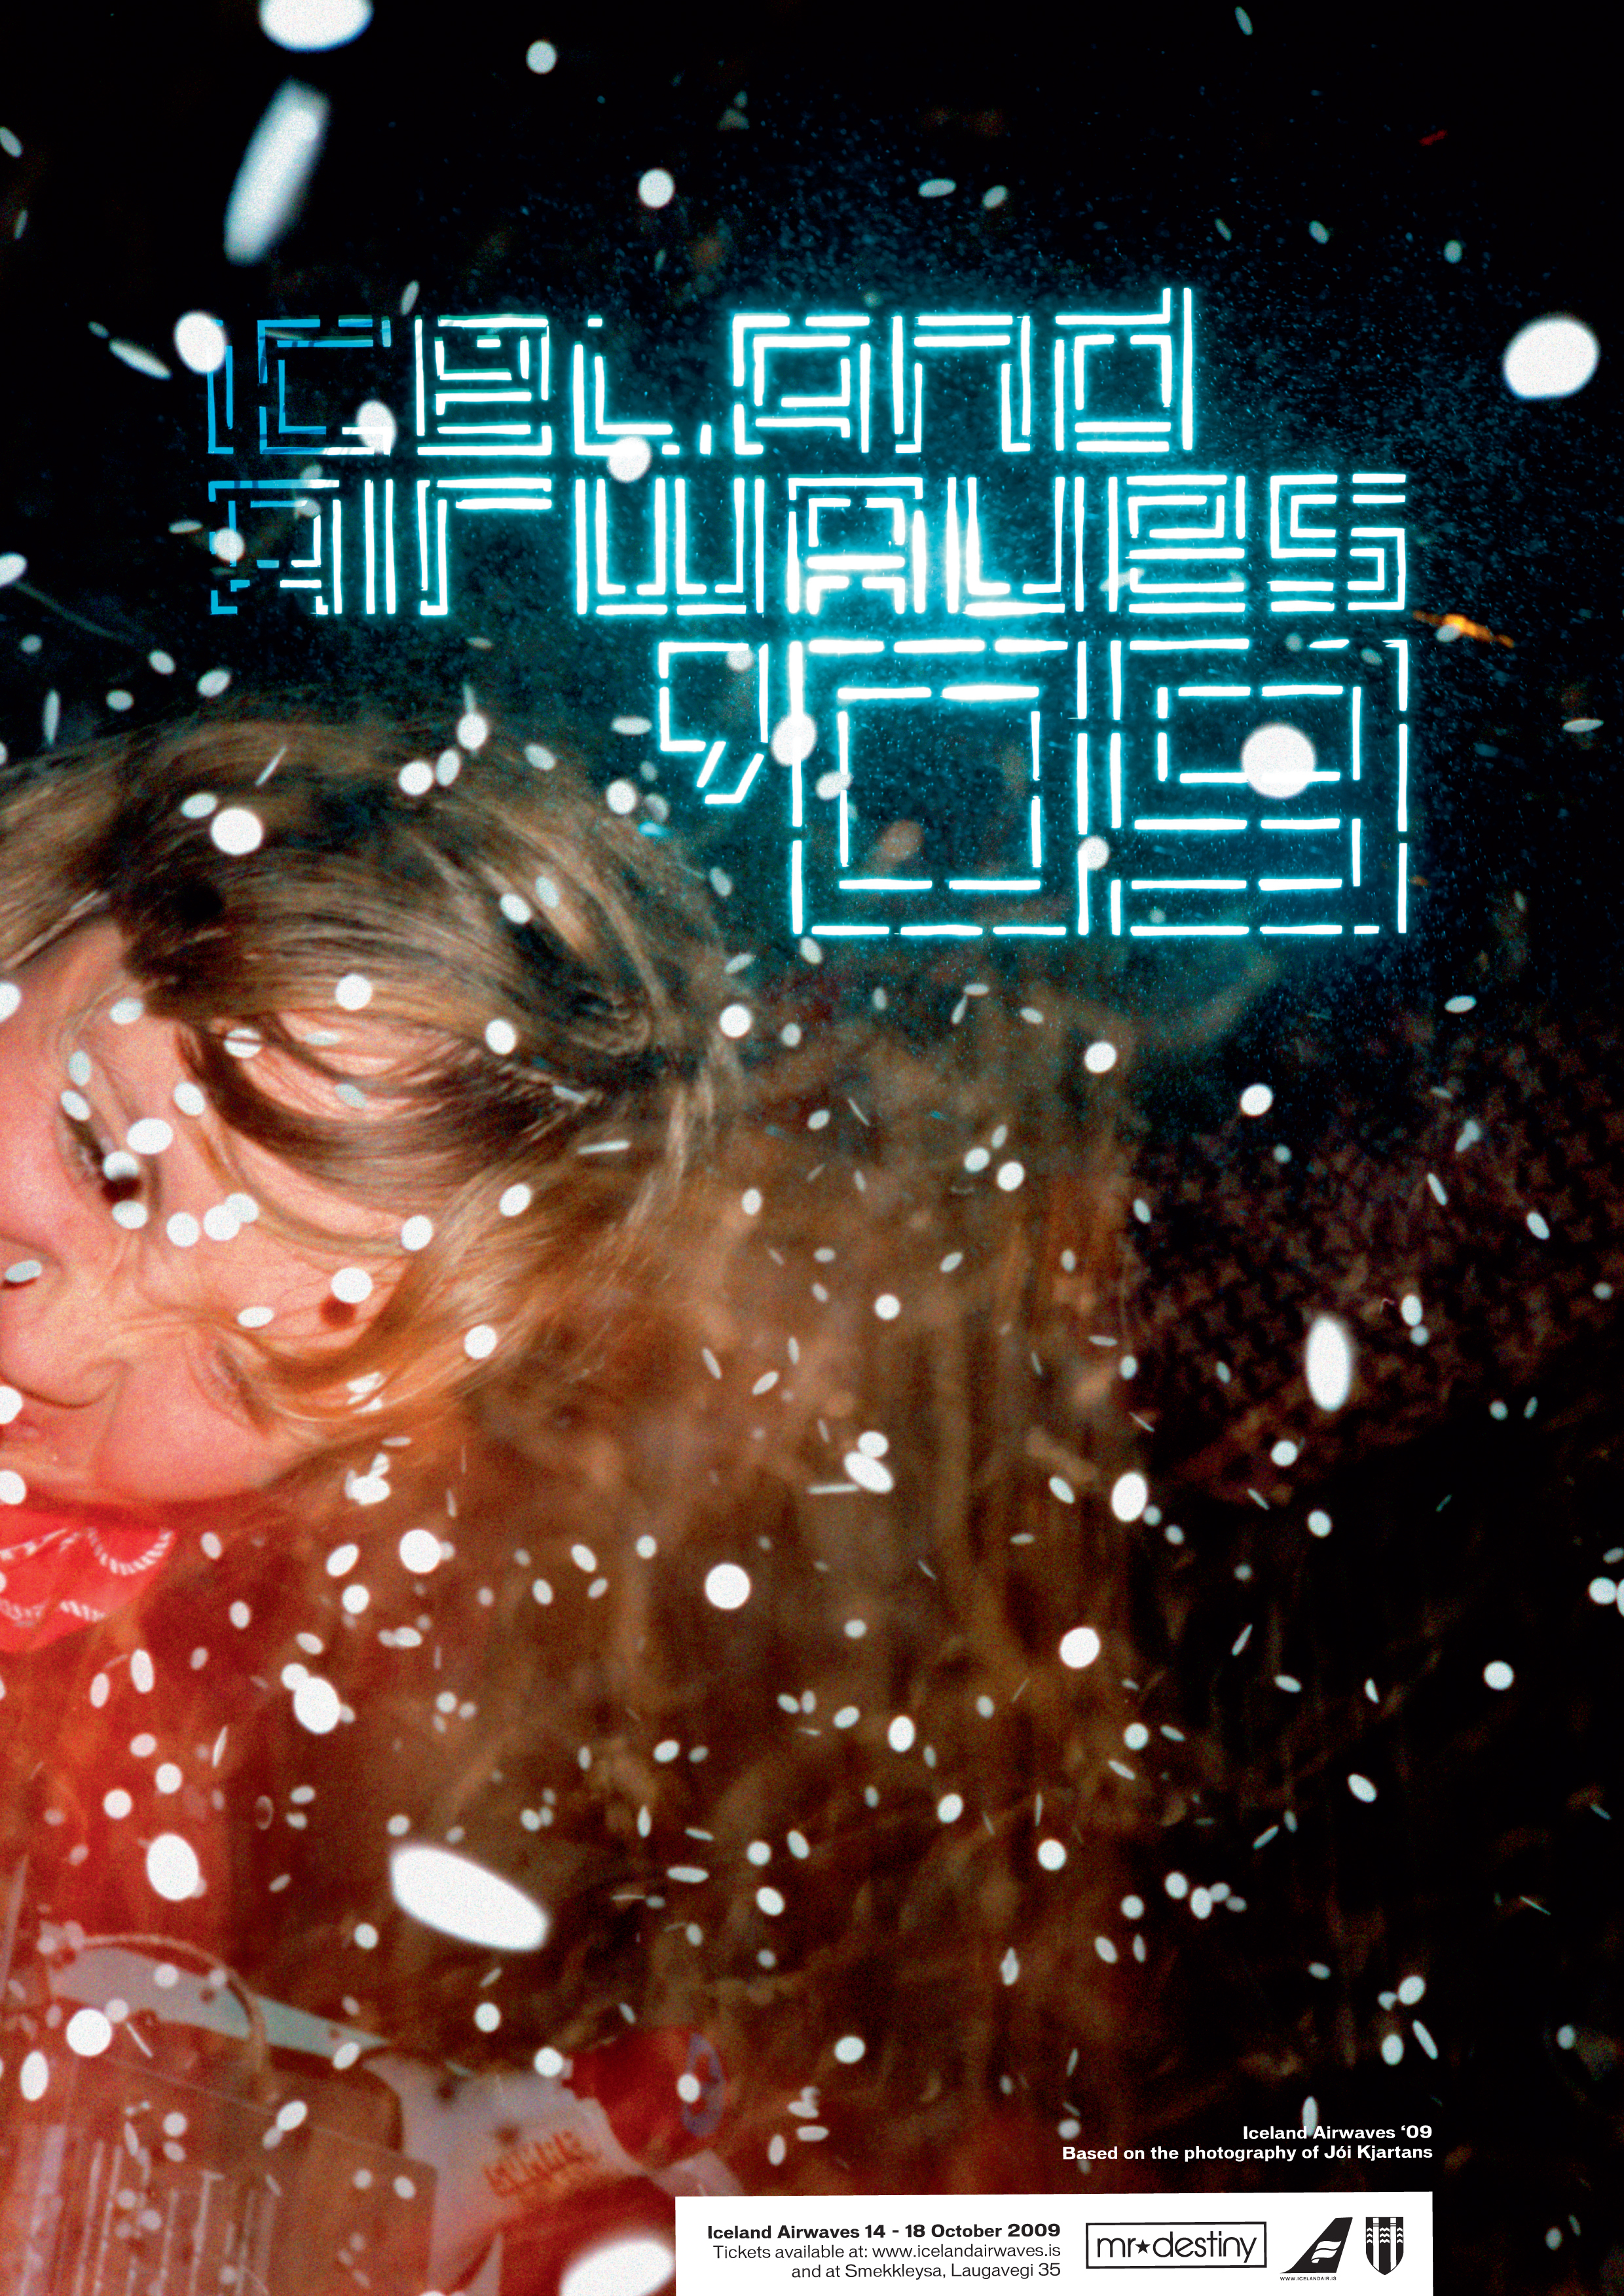 iceland airwaves '09 poster